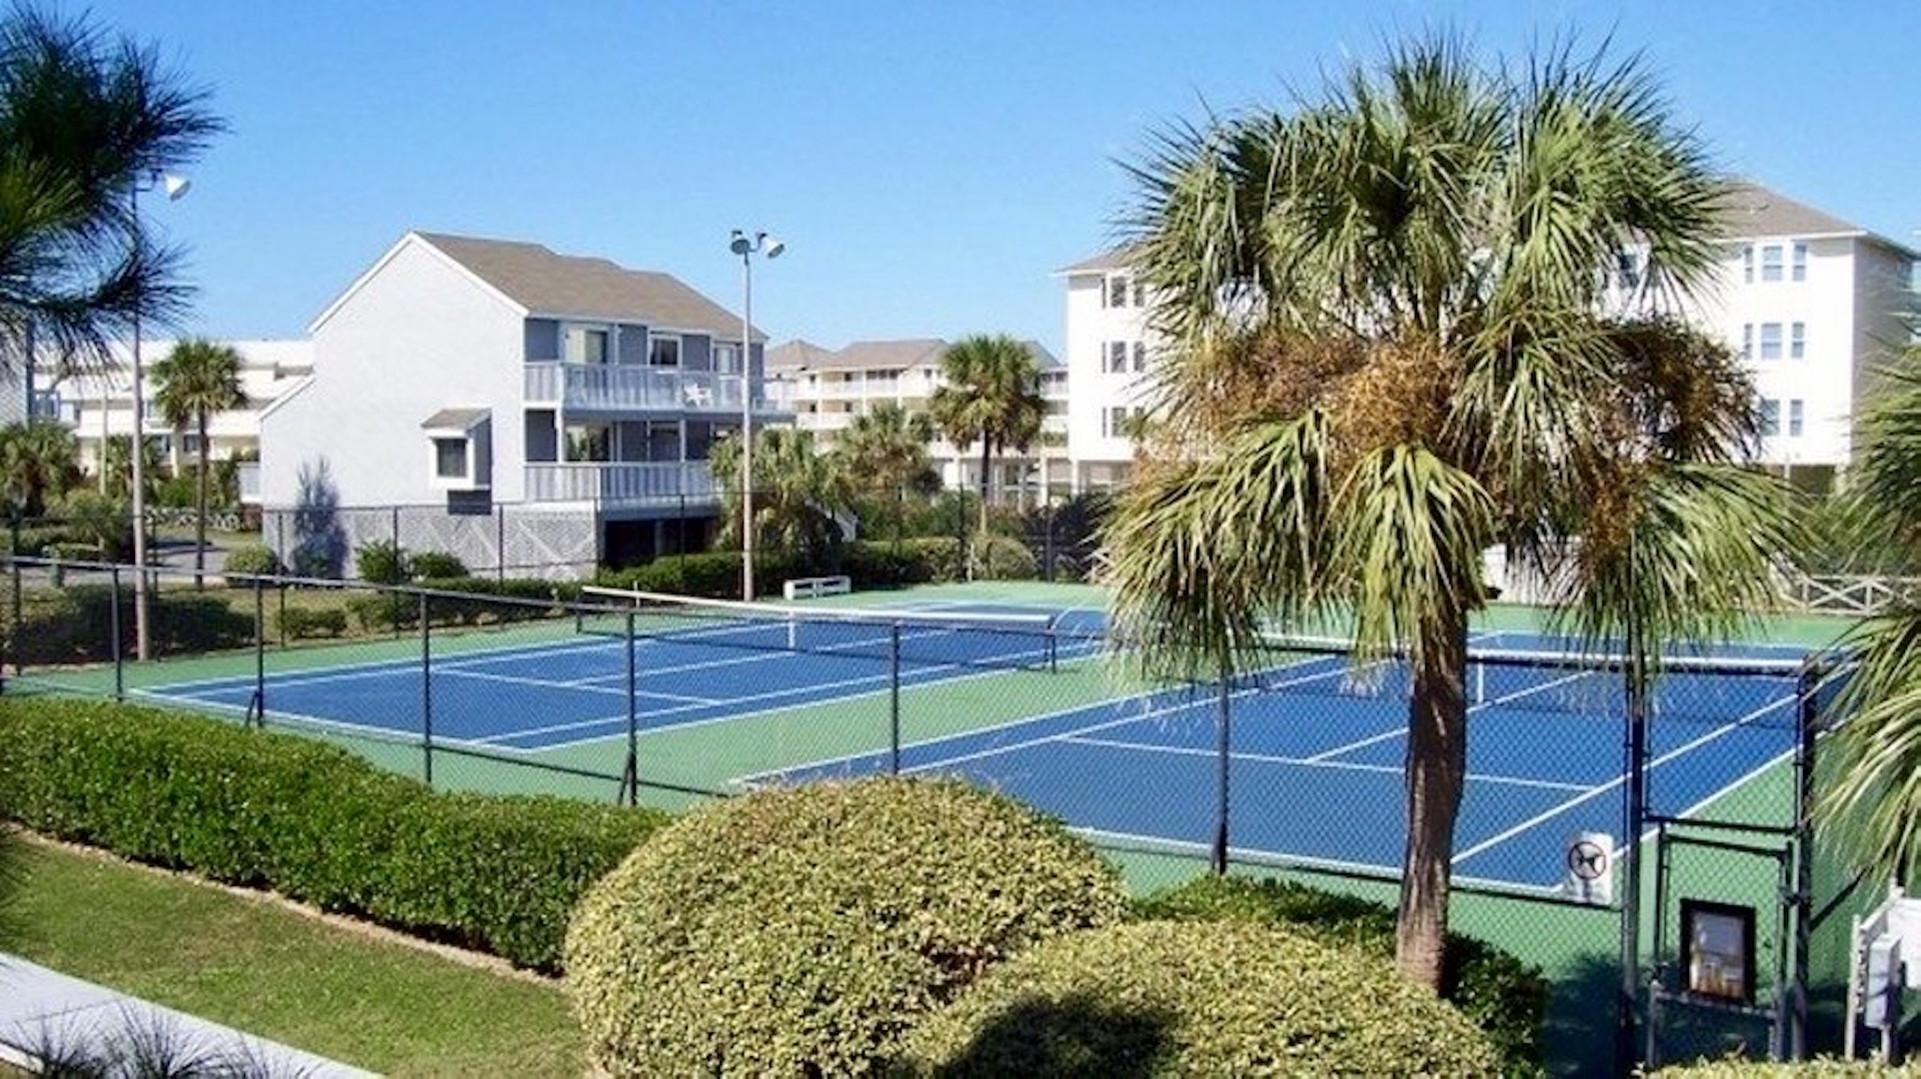 31 BD Tennis Courts